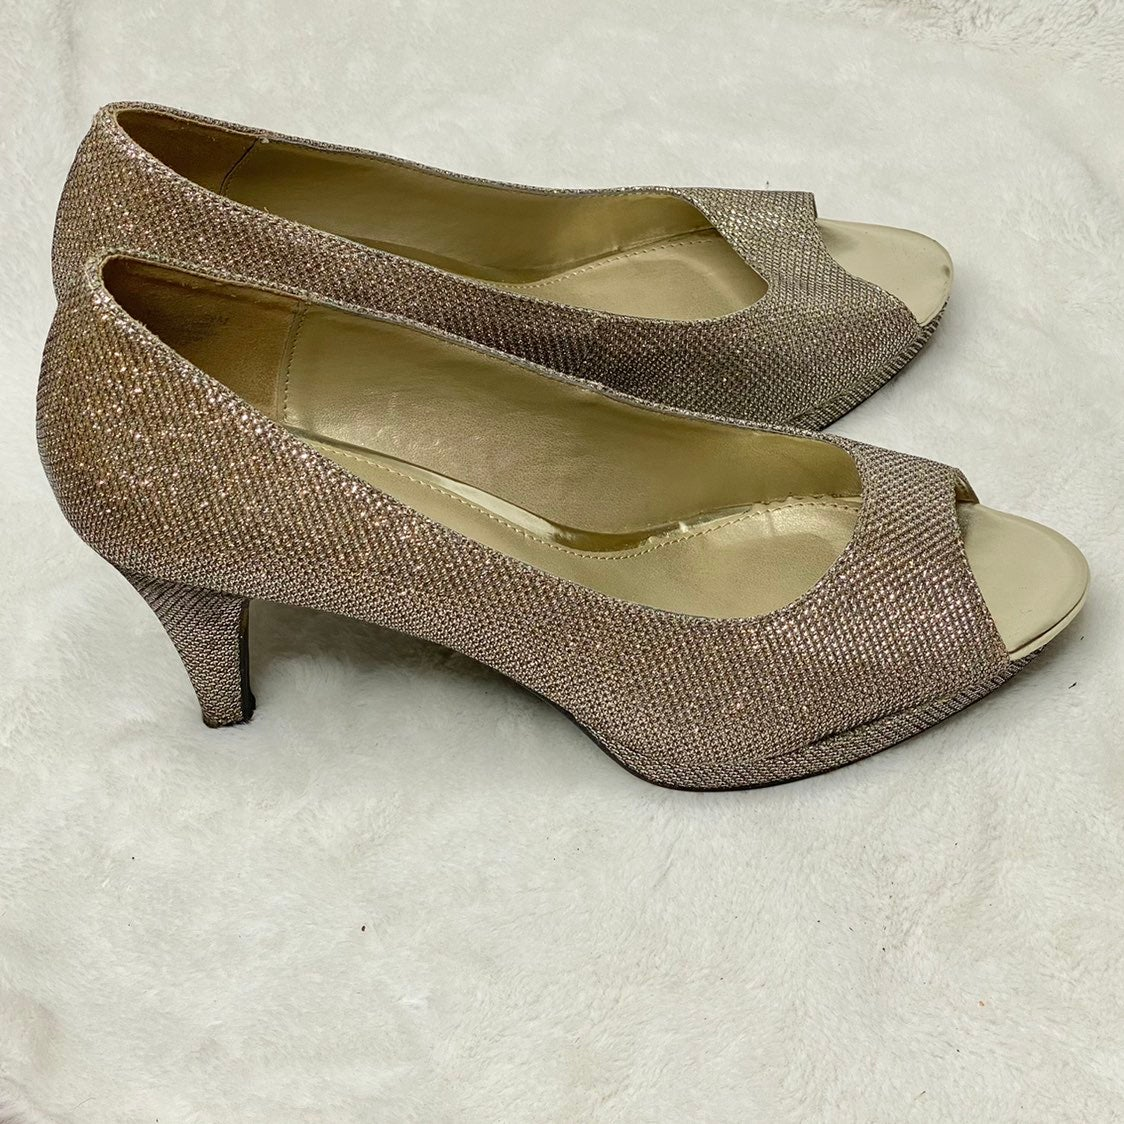 Bandolina Glitter Heels Size 9.5M